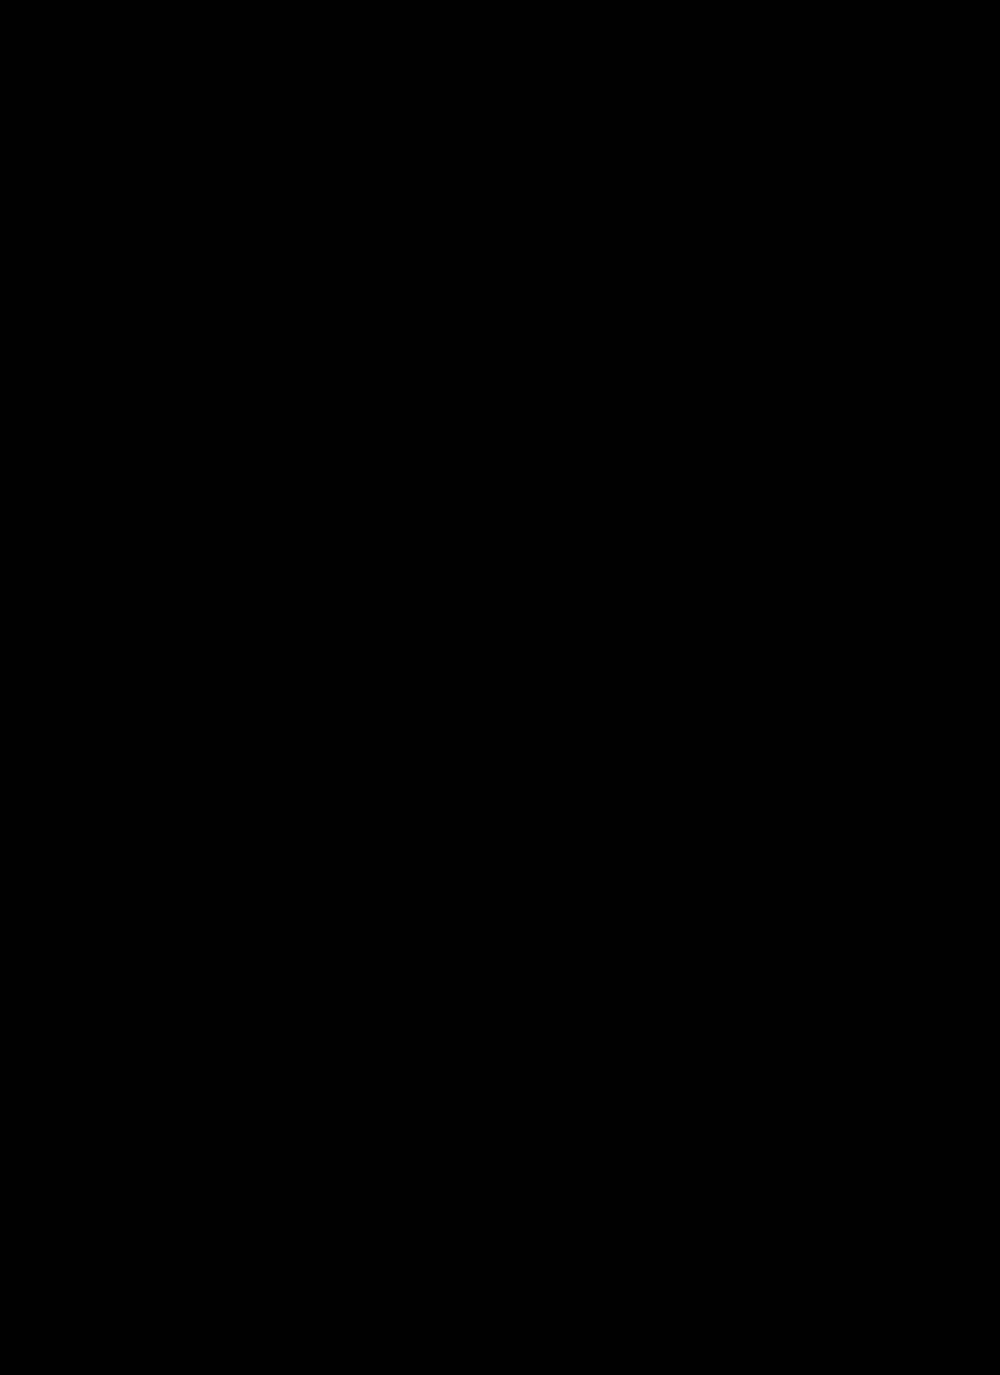 lic-003